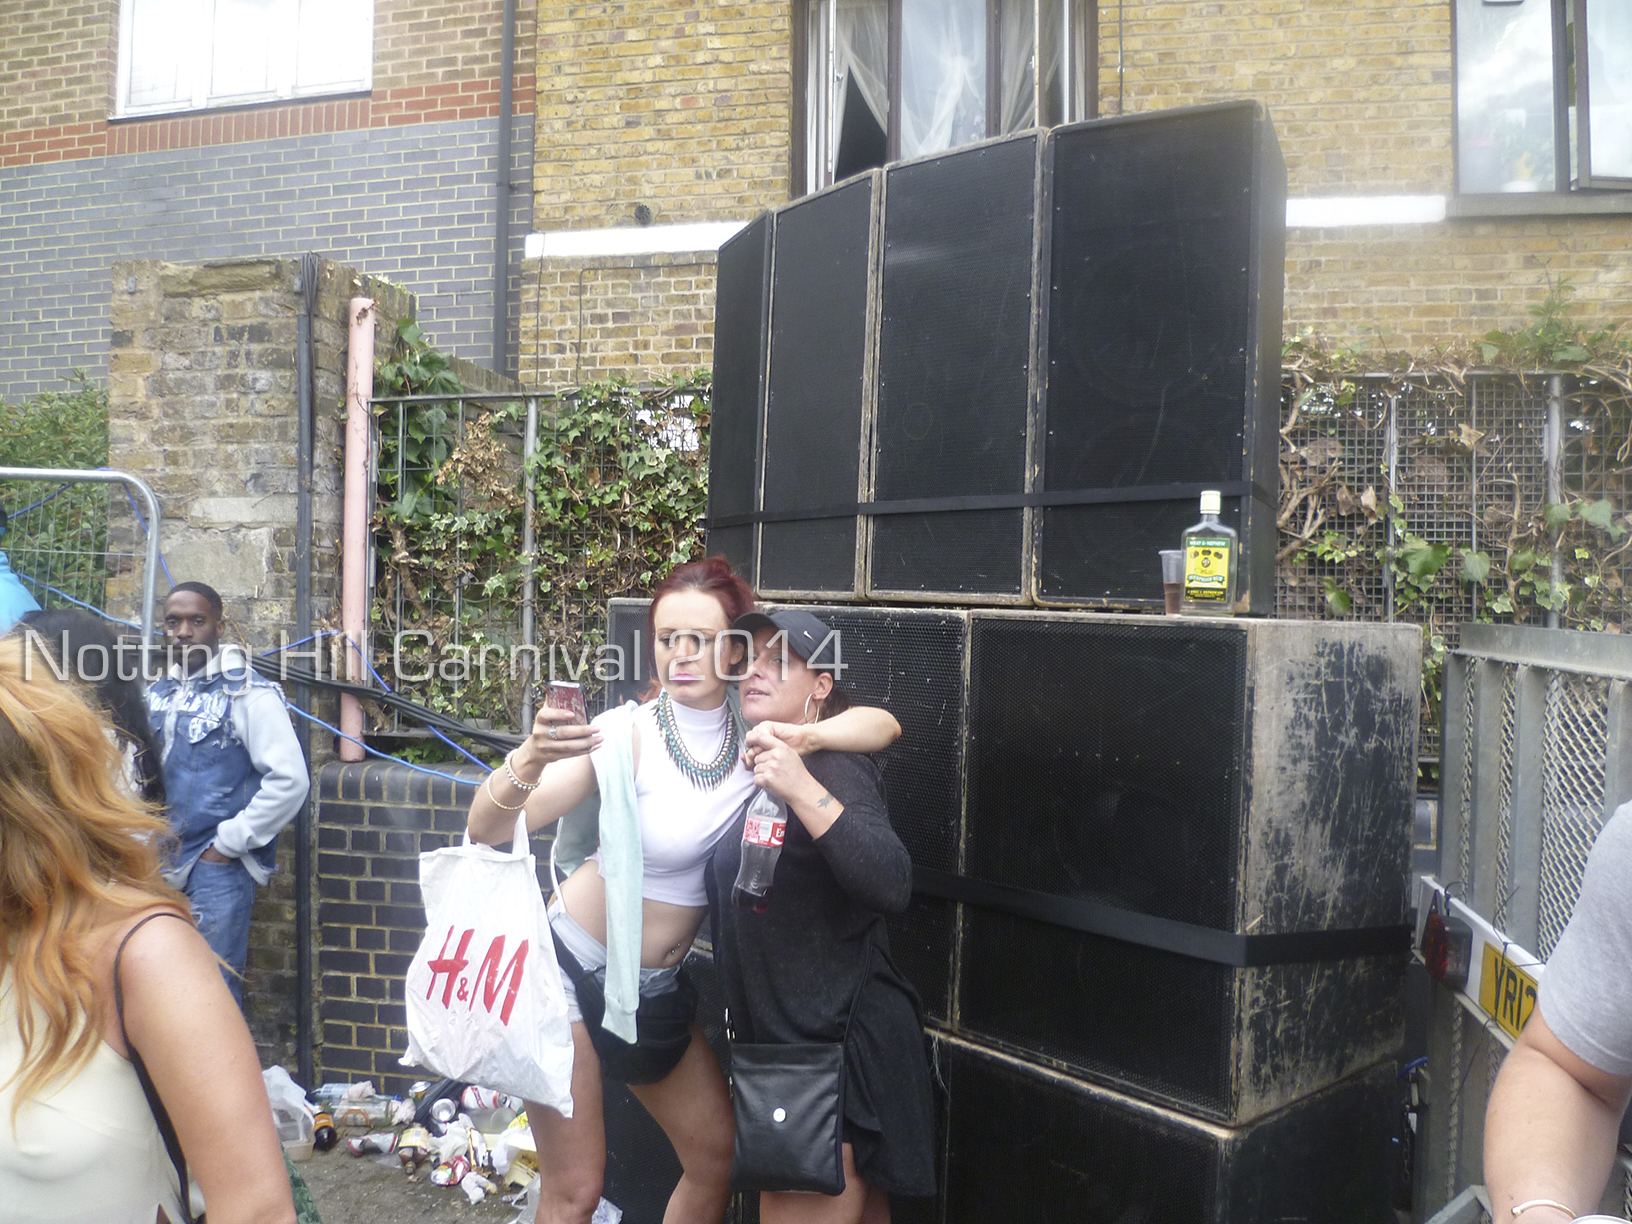 Notting-Hill-Carnival-2014-Street-Sound-System-25